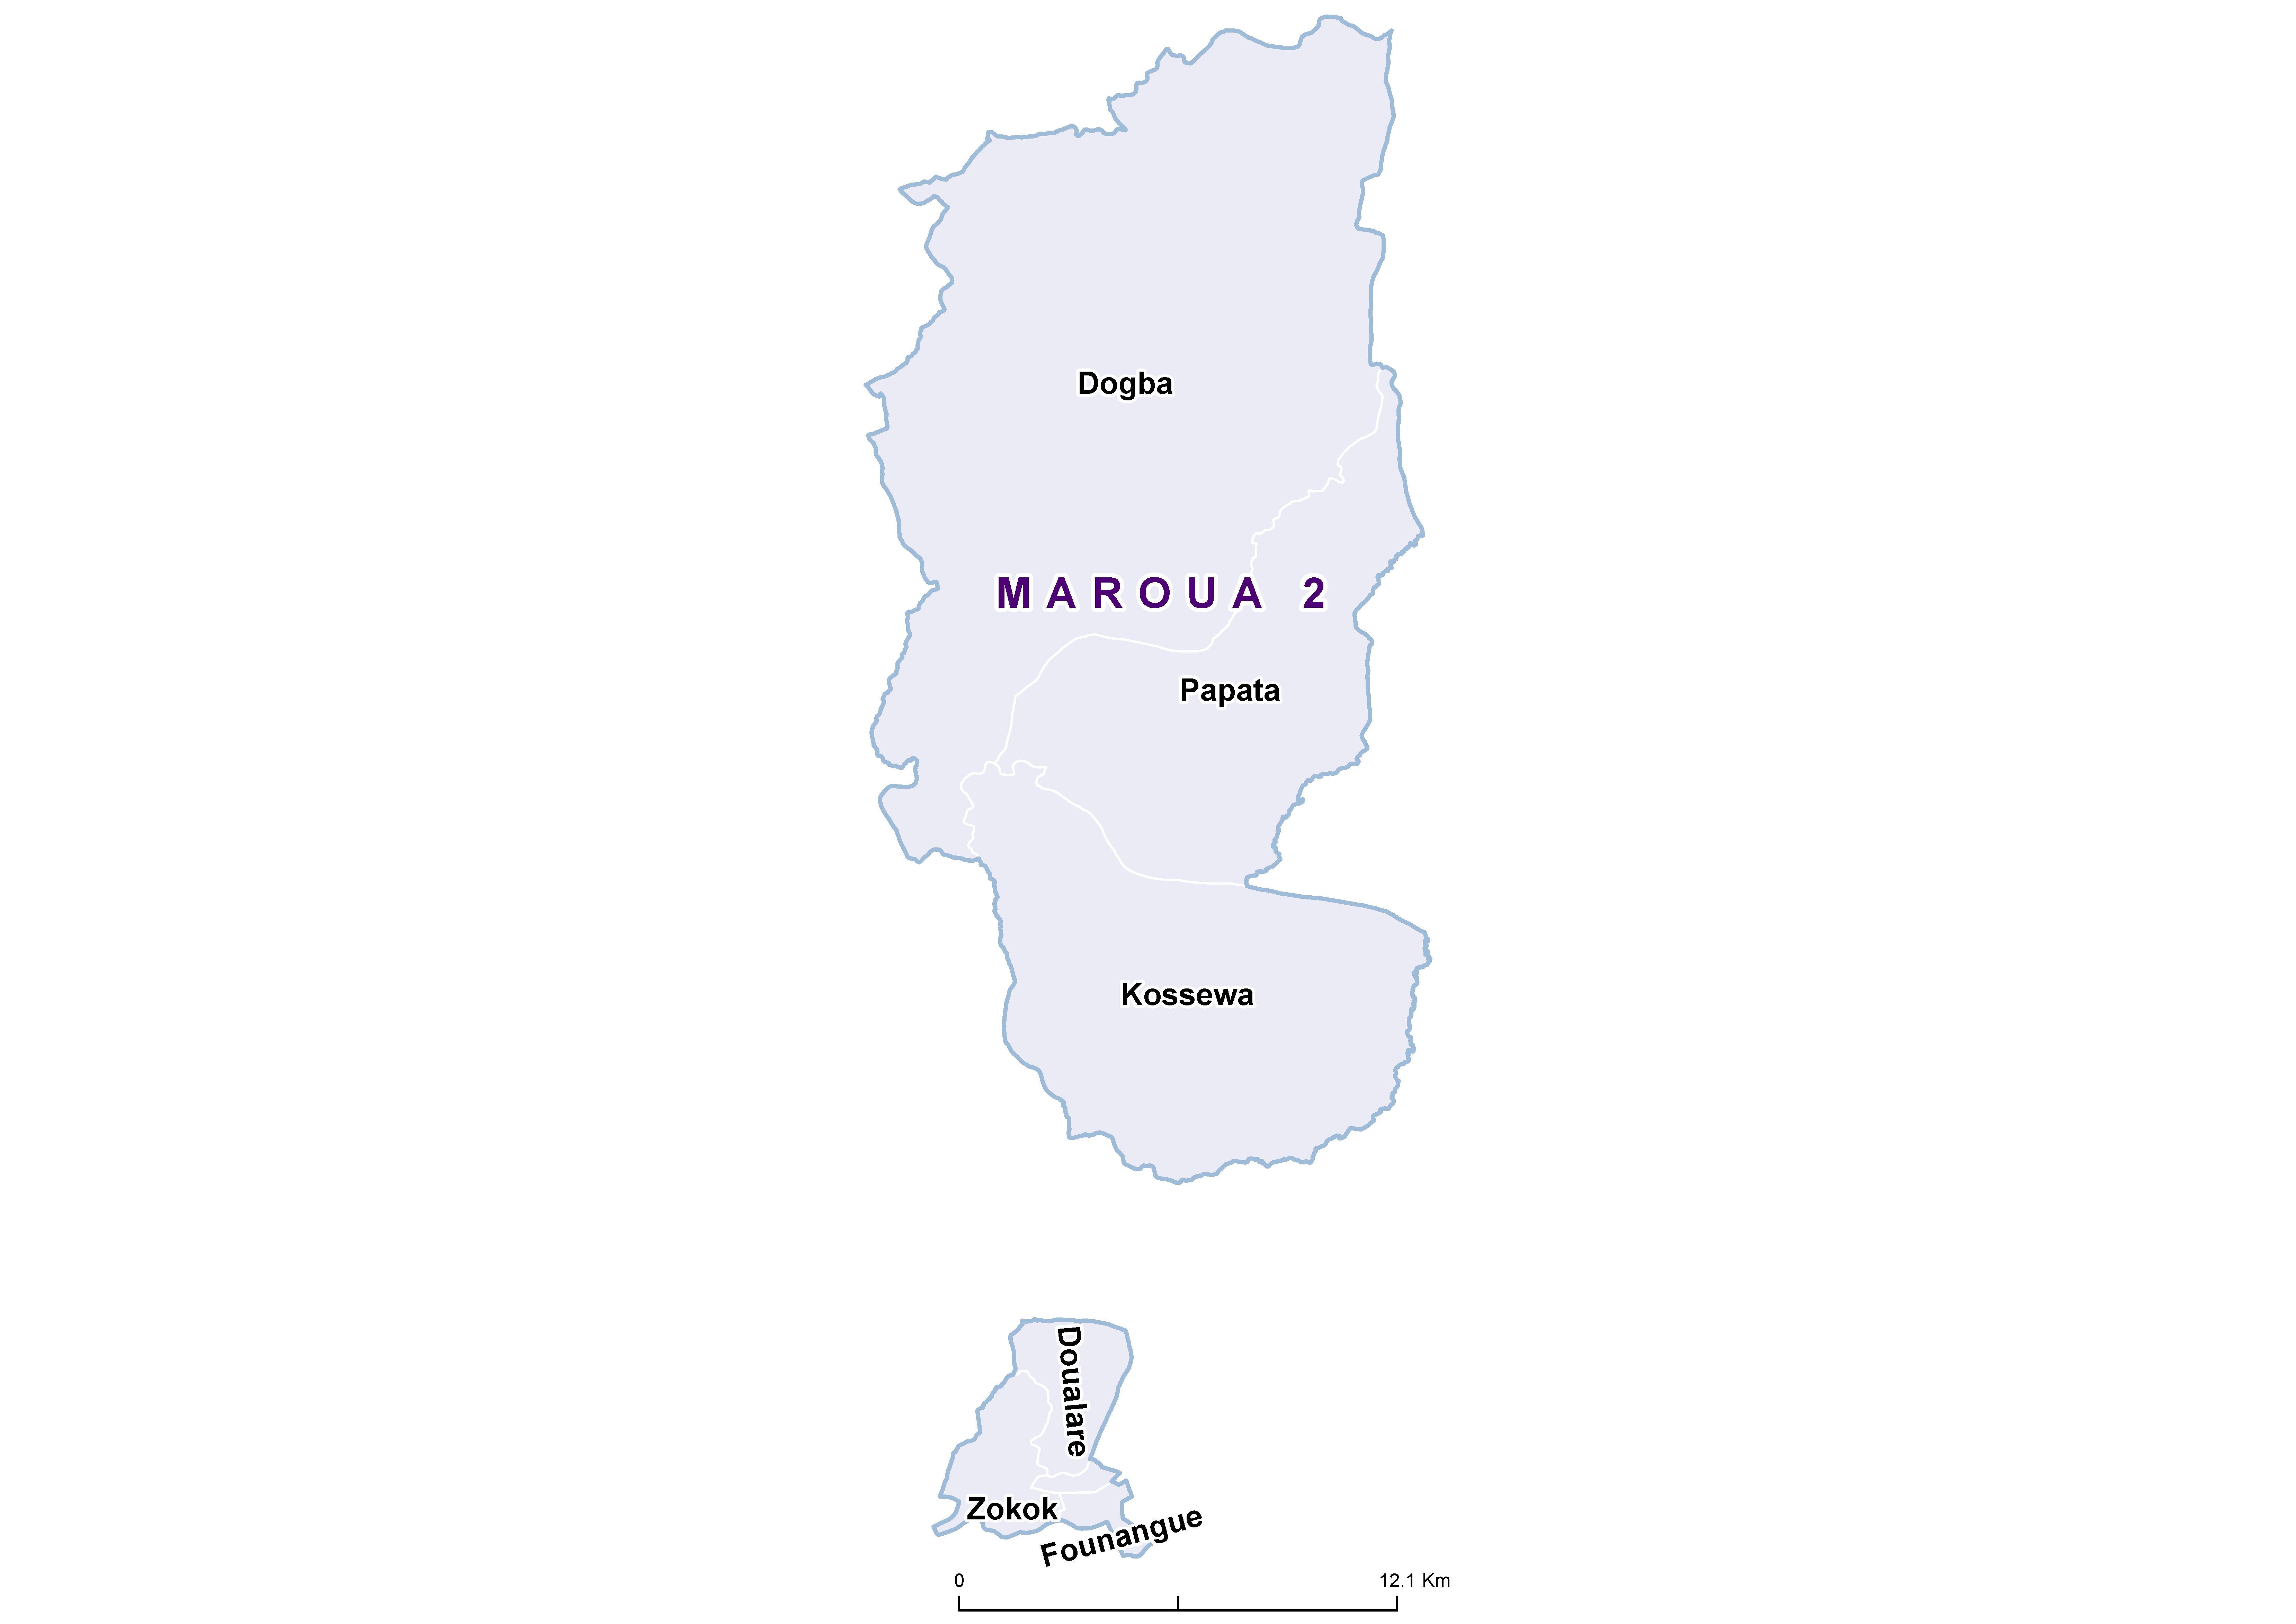 Maroua 2 SCH 20180001